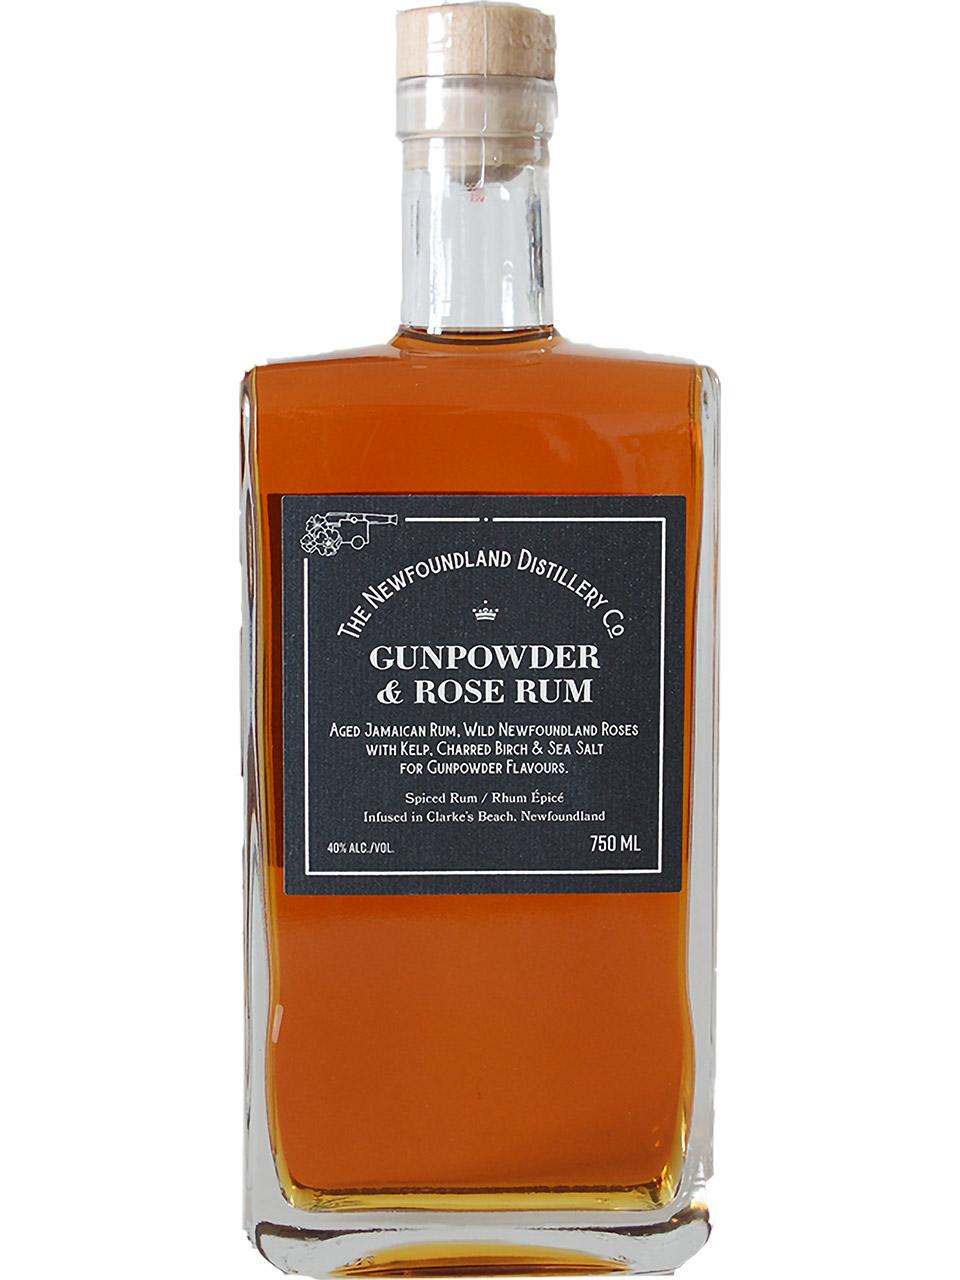 The Newfoundland Distillery Co Gunpowder&Rose Rum